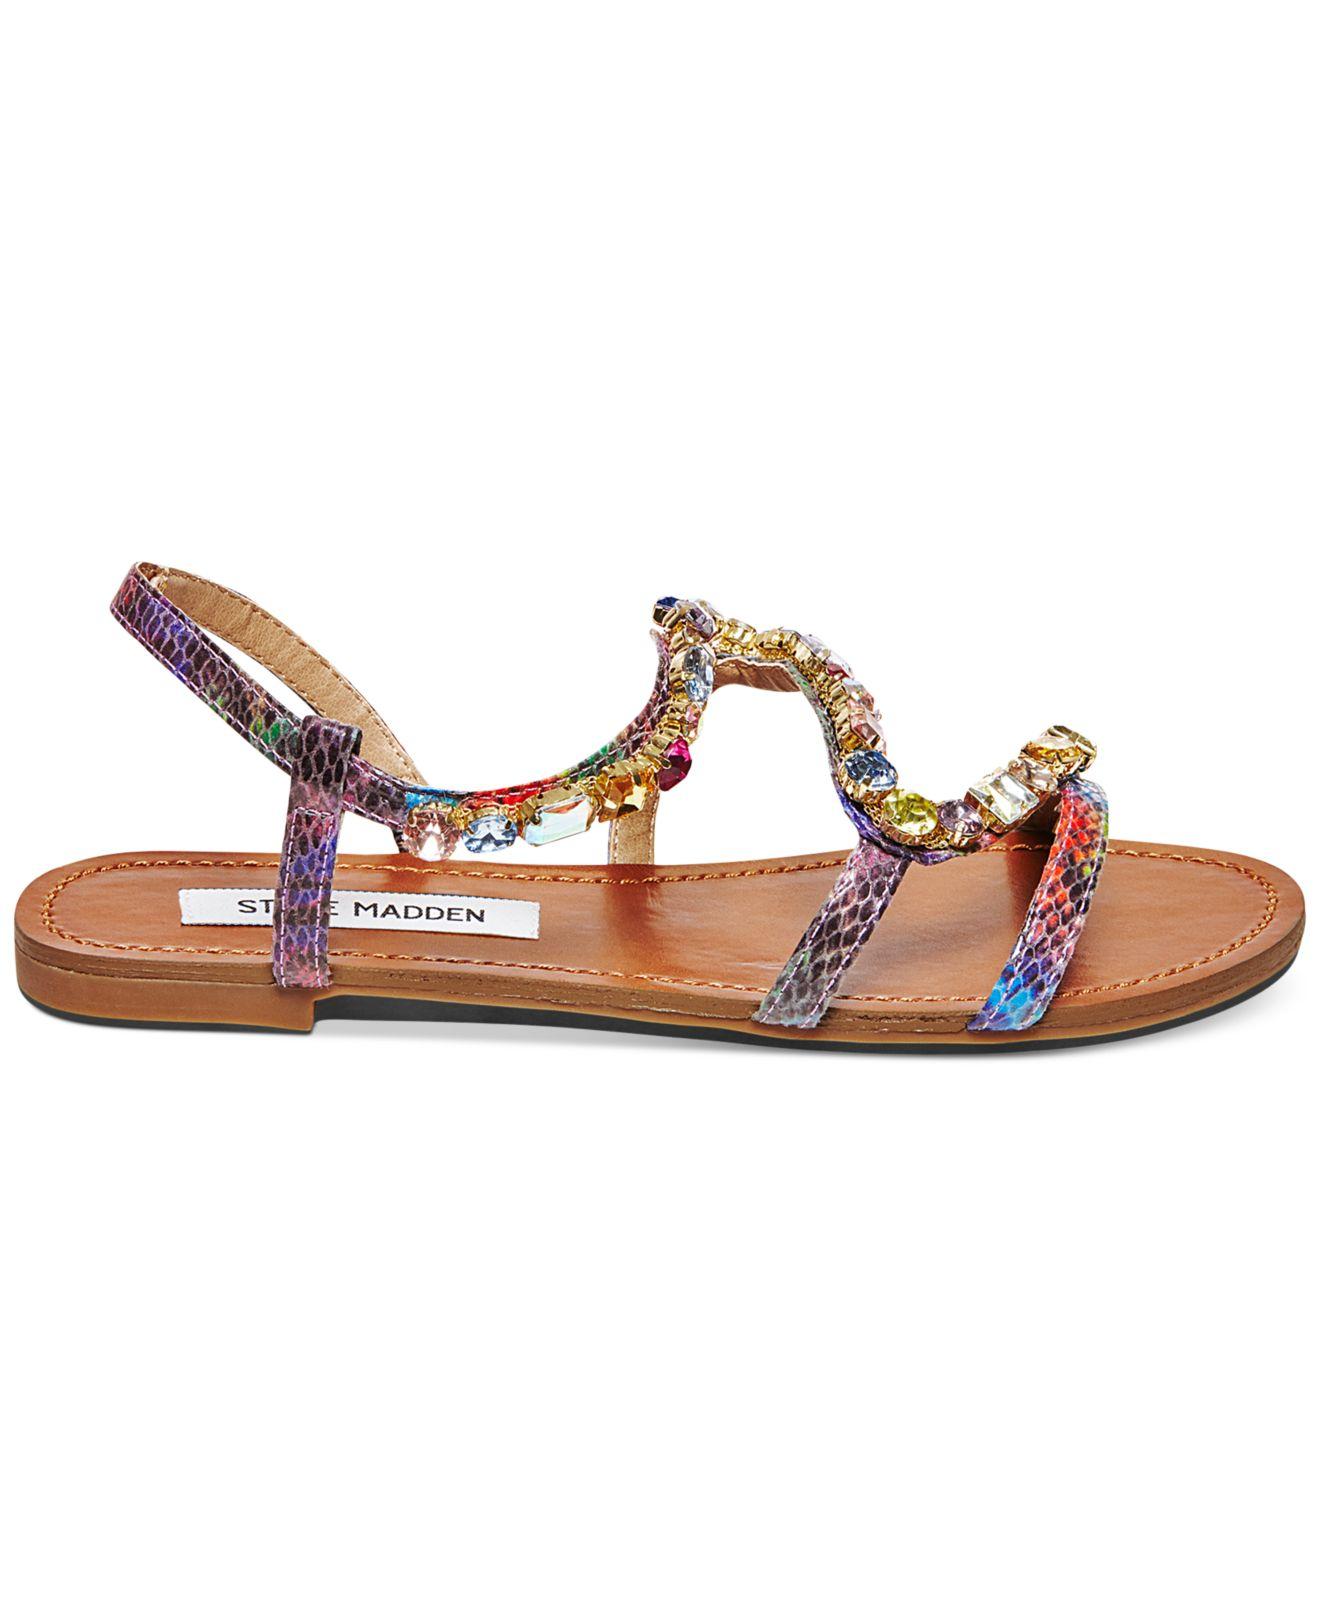 Steve Madden Blazzzed Jeweled Flat Sandals | Lyst